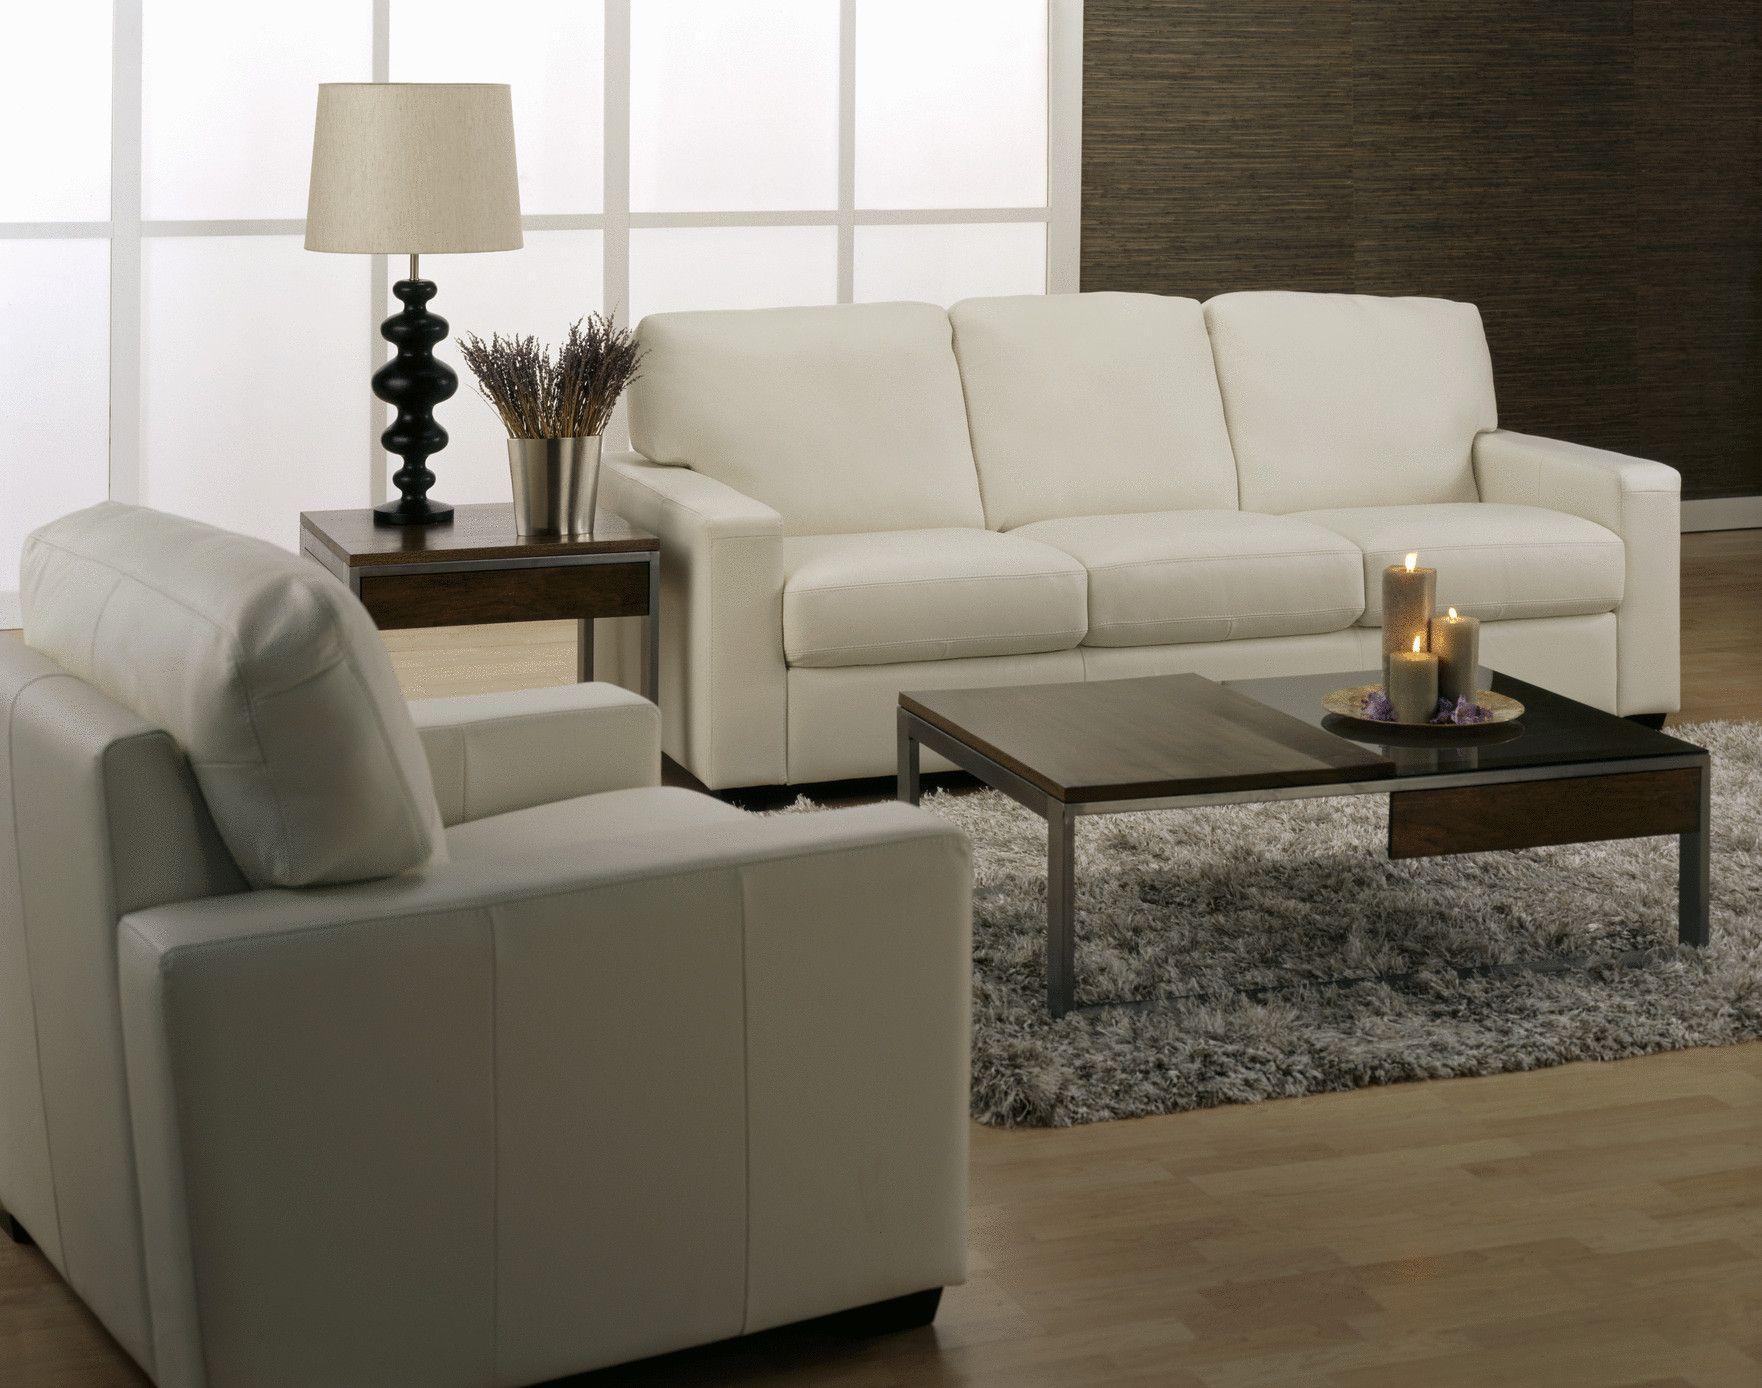 Palliser Leather Furniture